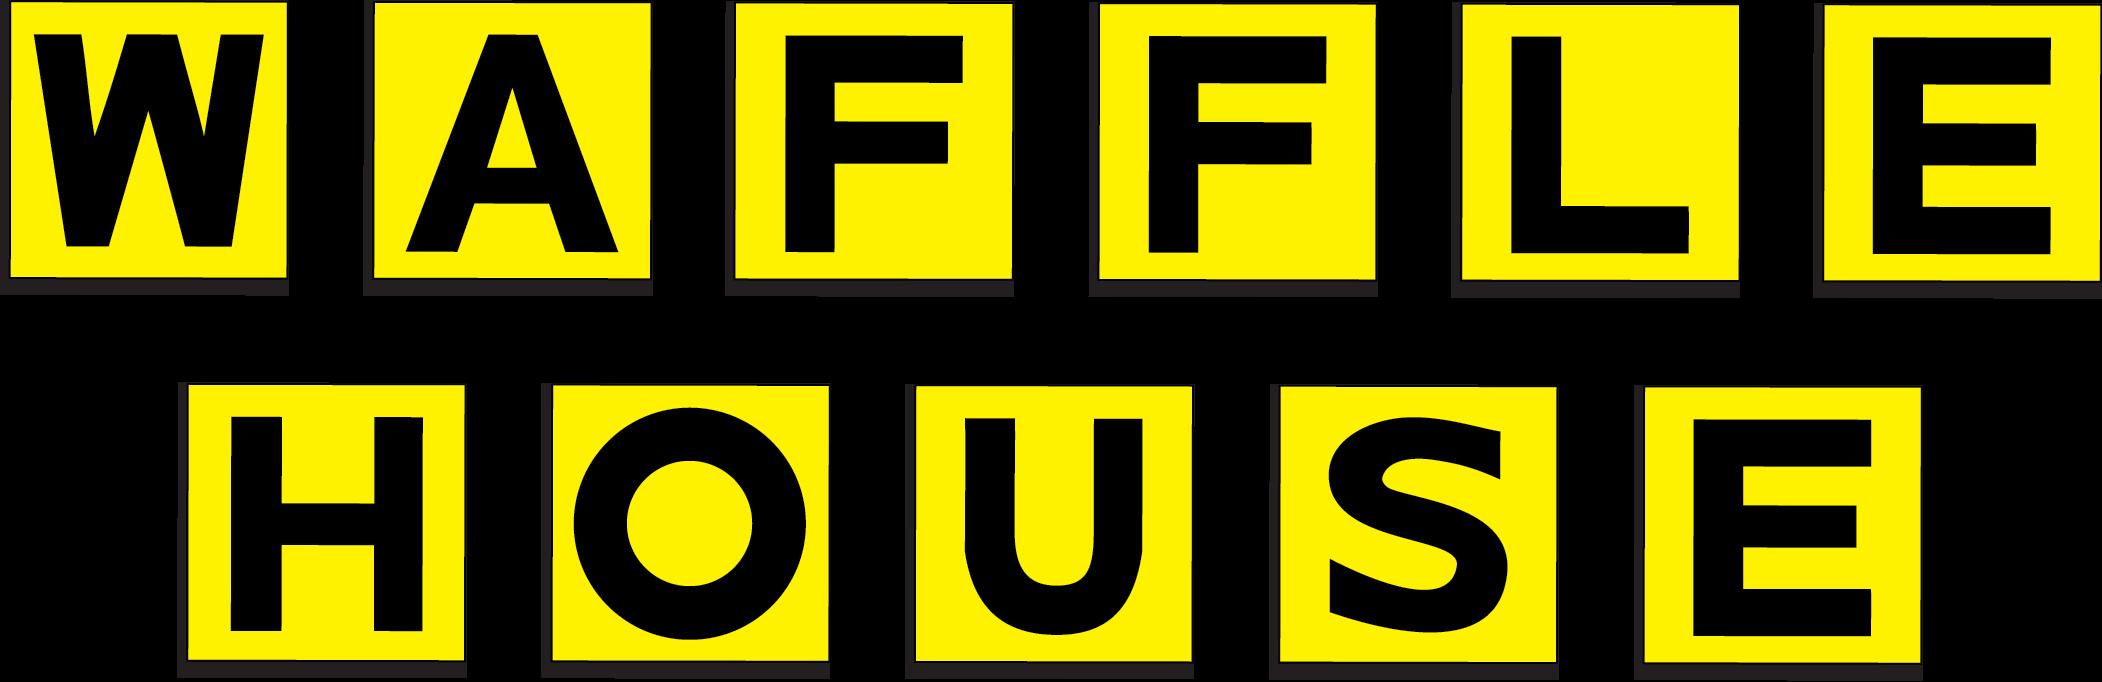 Waffle House Webstore